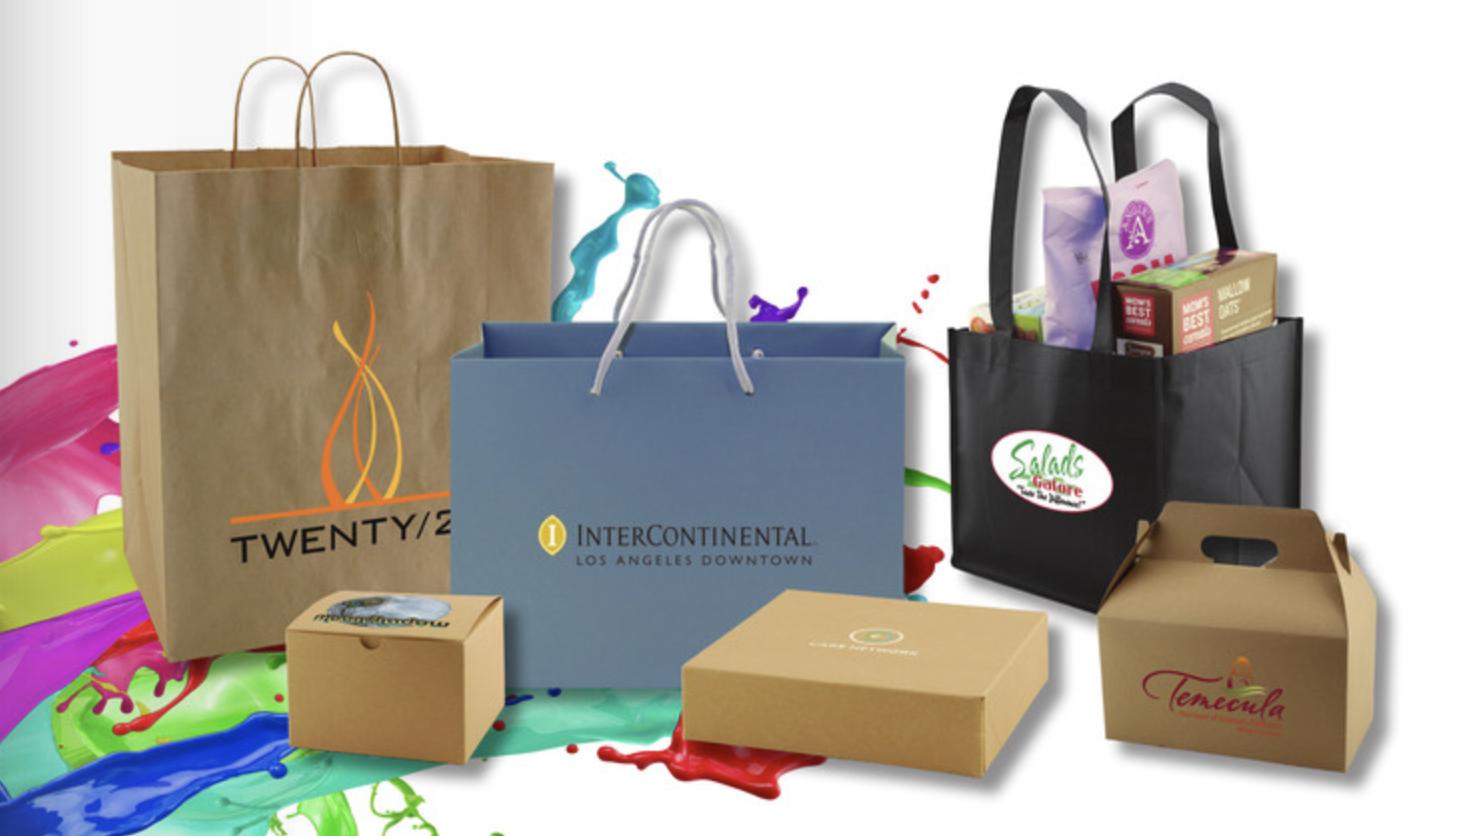 printed-grocery-bags-tote-euro-paper-reusable.jpg